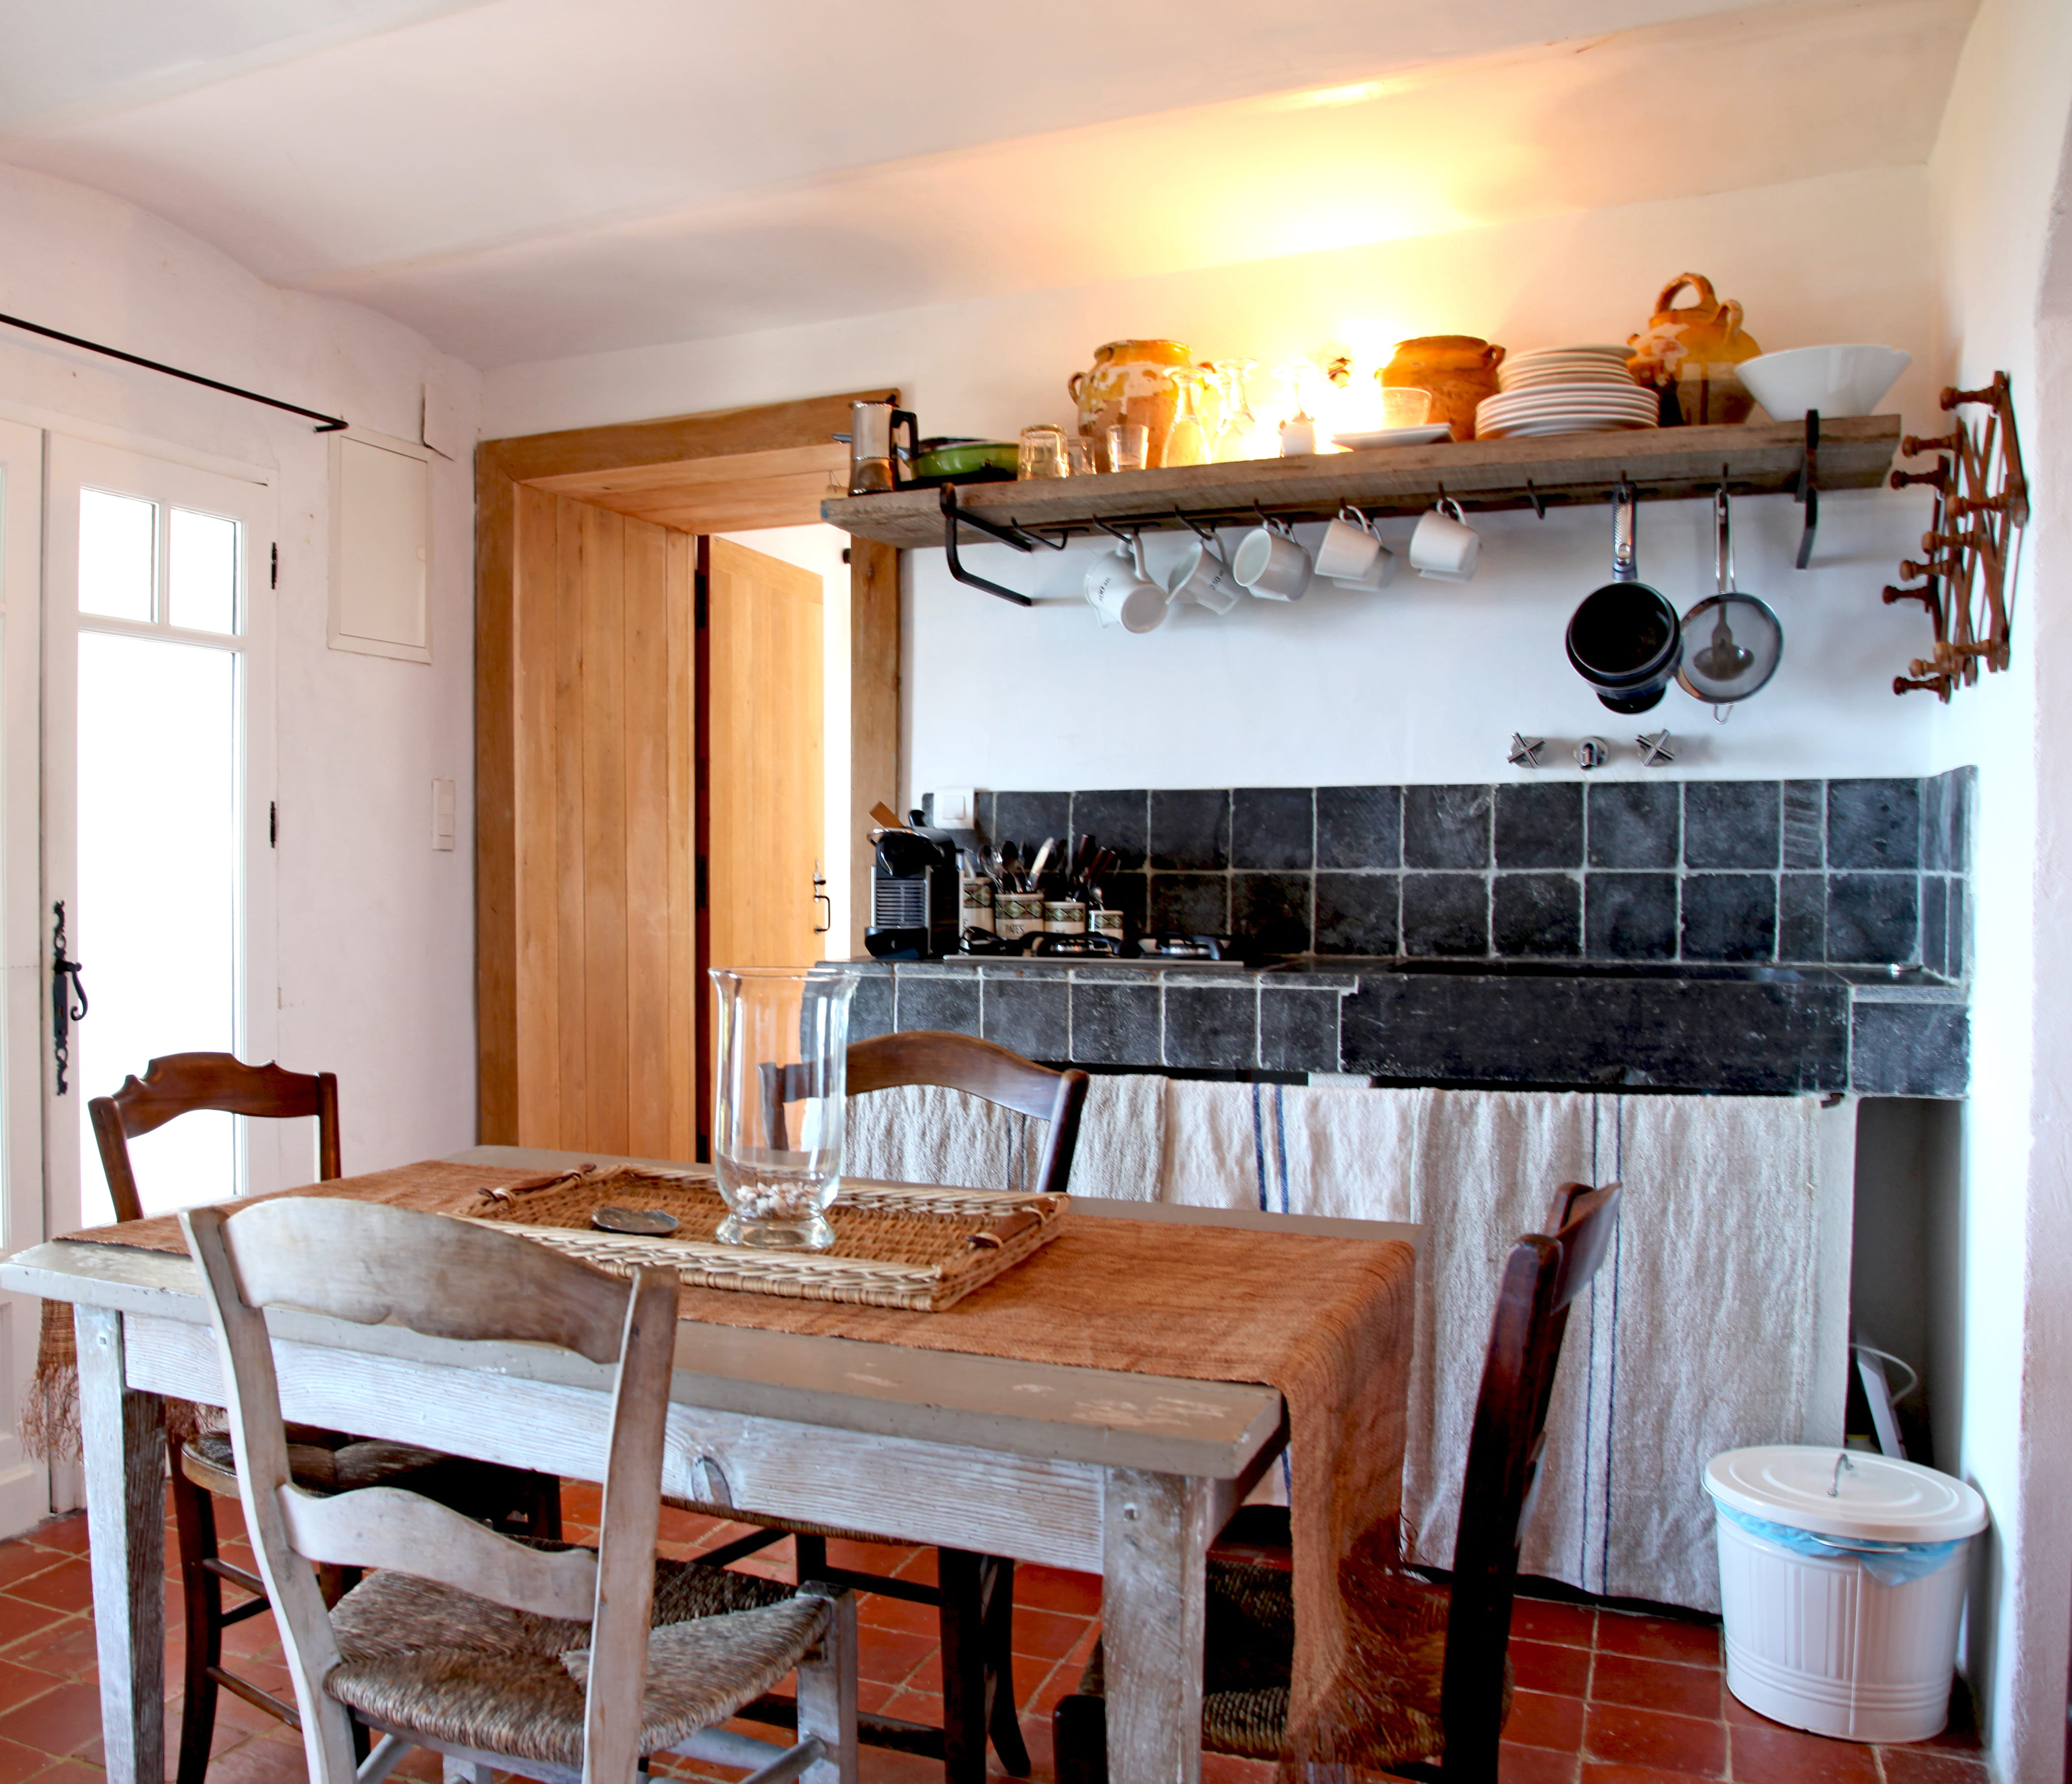 Amenagement cuisine petit espace astuces am nagemer une - Idee amenagement cuisine petit espace ...